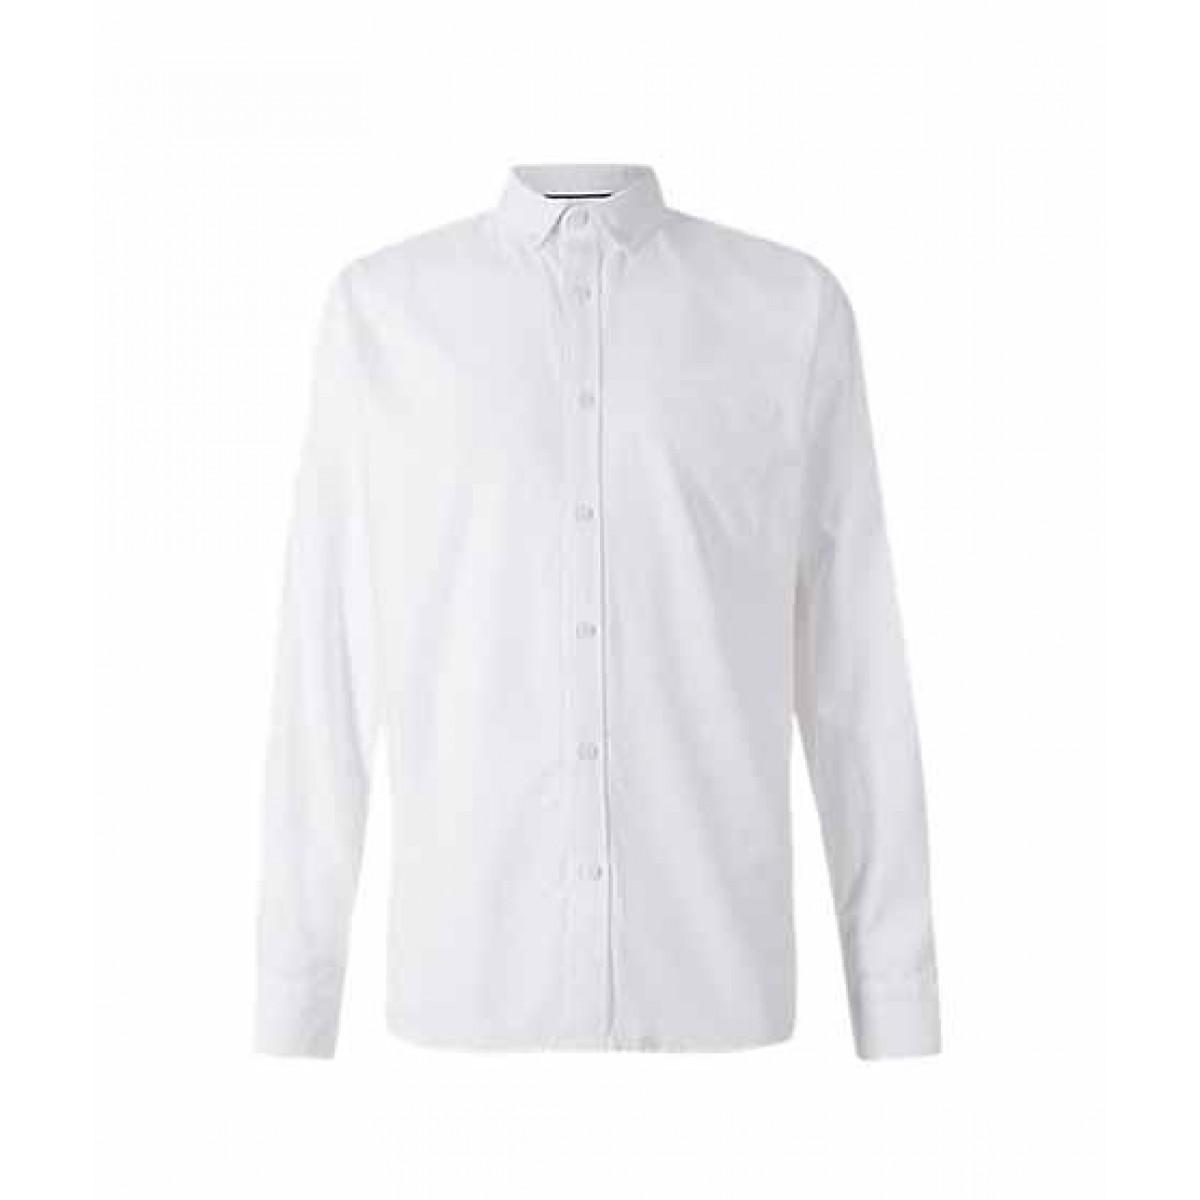 2d1f5748378 Marks   Spencer Plain Oxford Men s Shirt White Mix (T253201M)